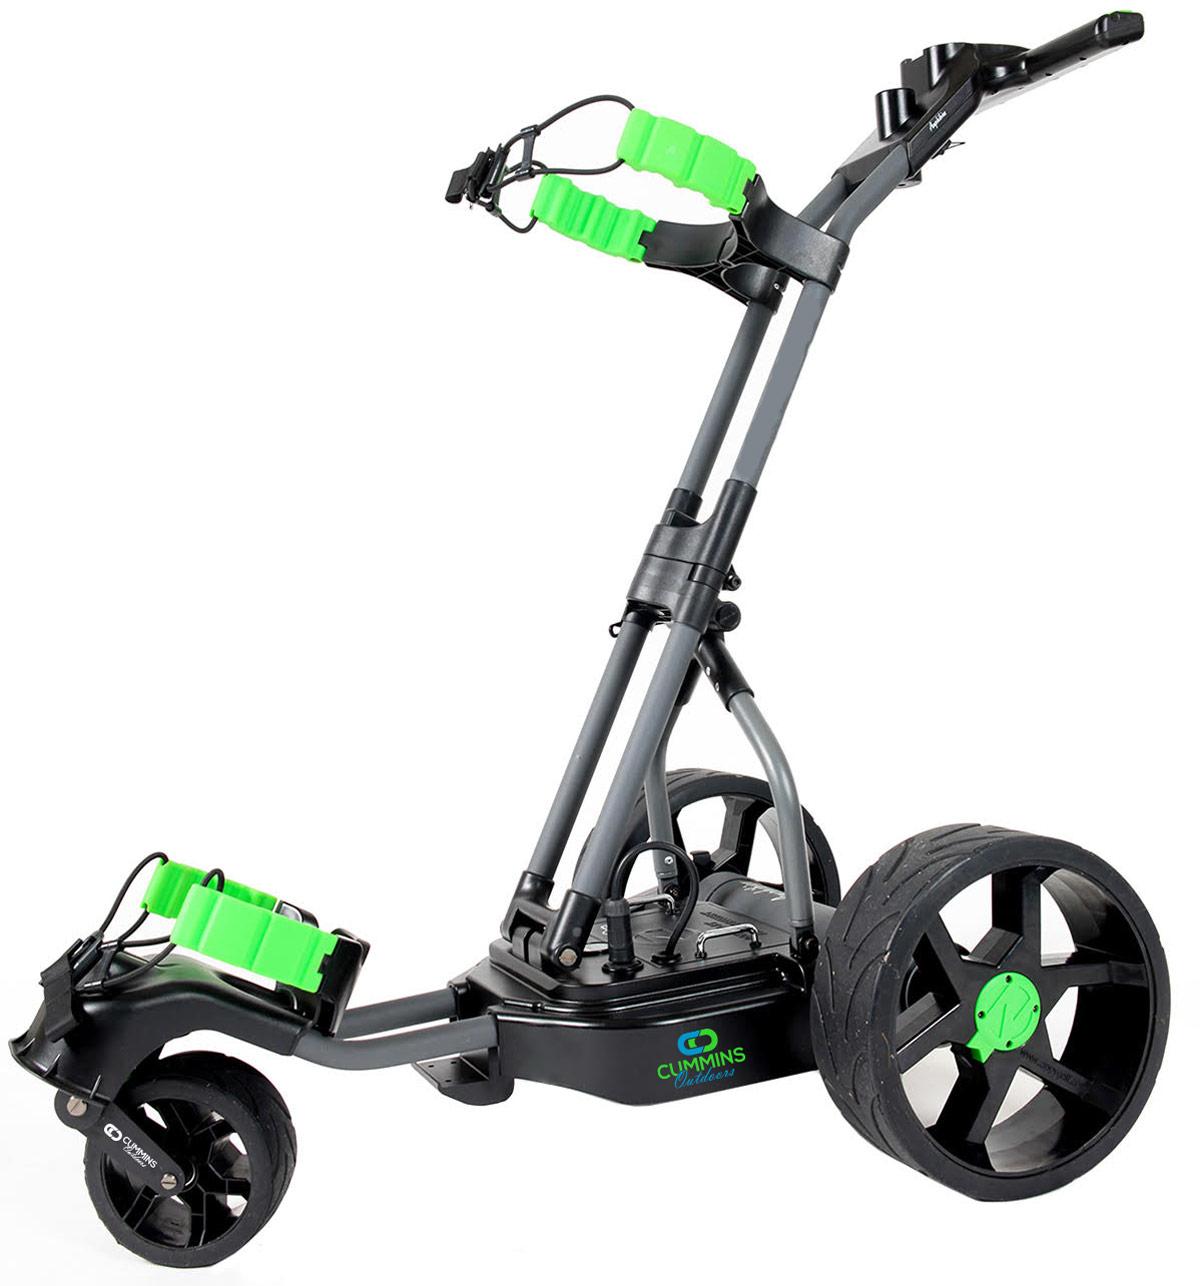 The Alligator 100% Waterproof Electric Remote-Control Golf Caddie